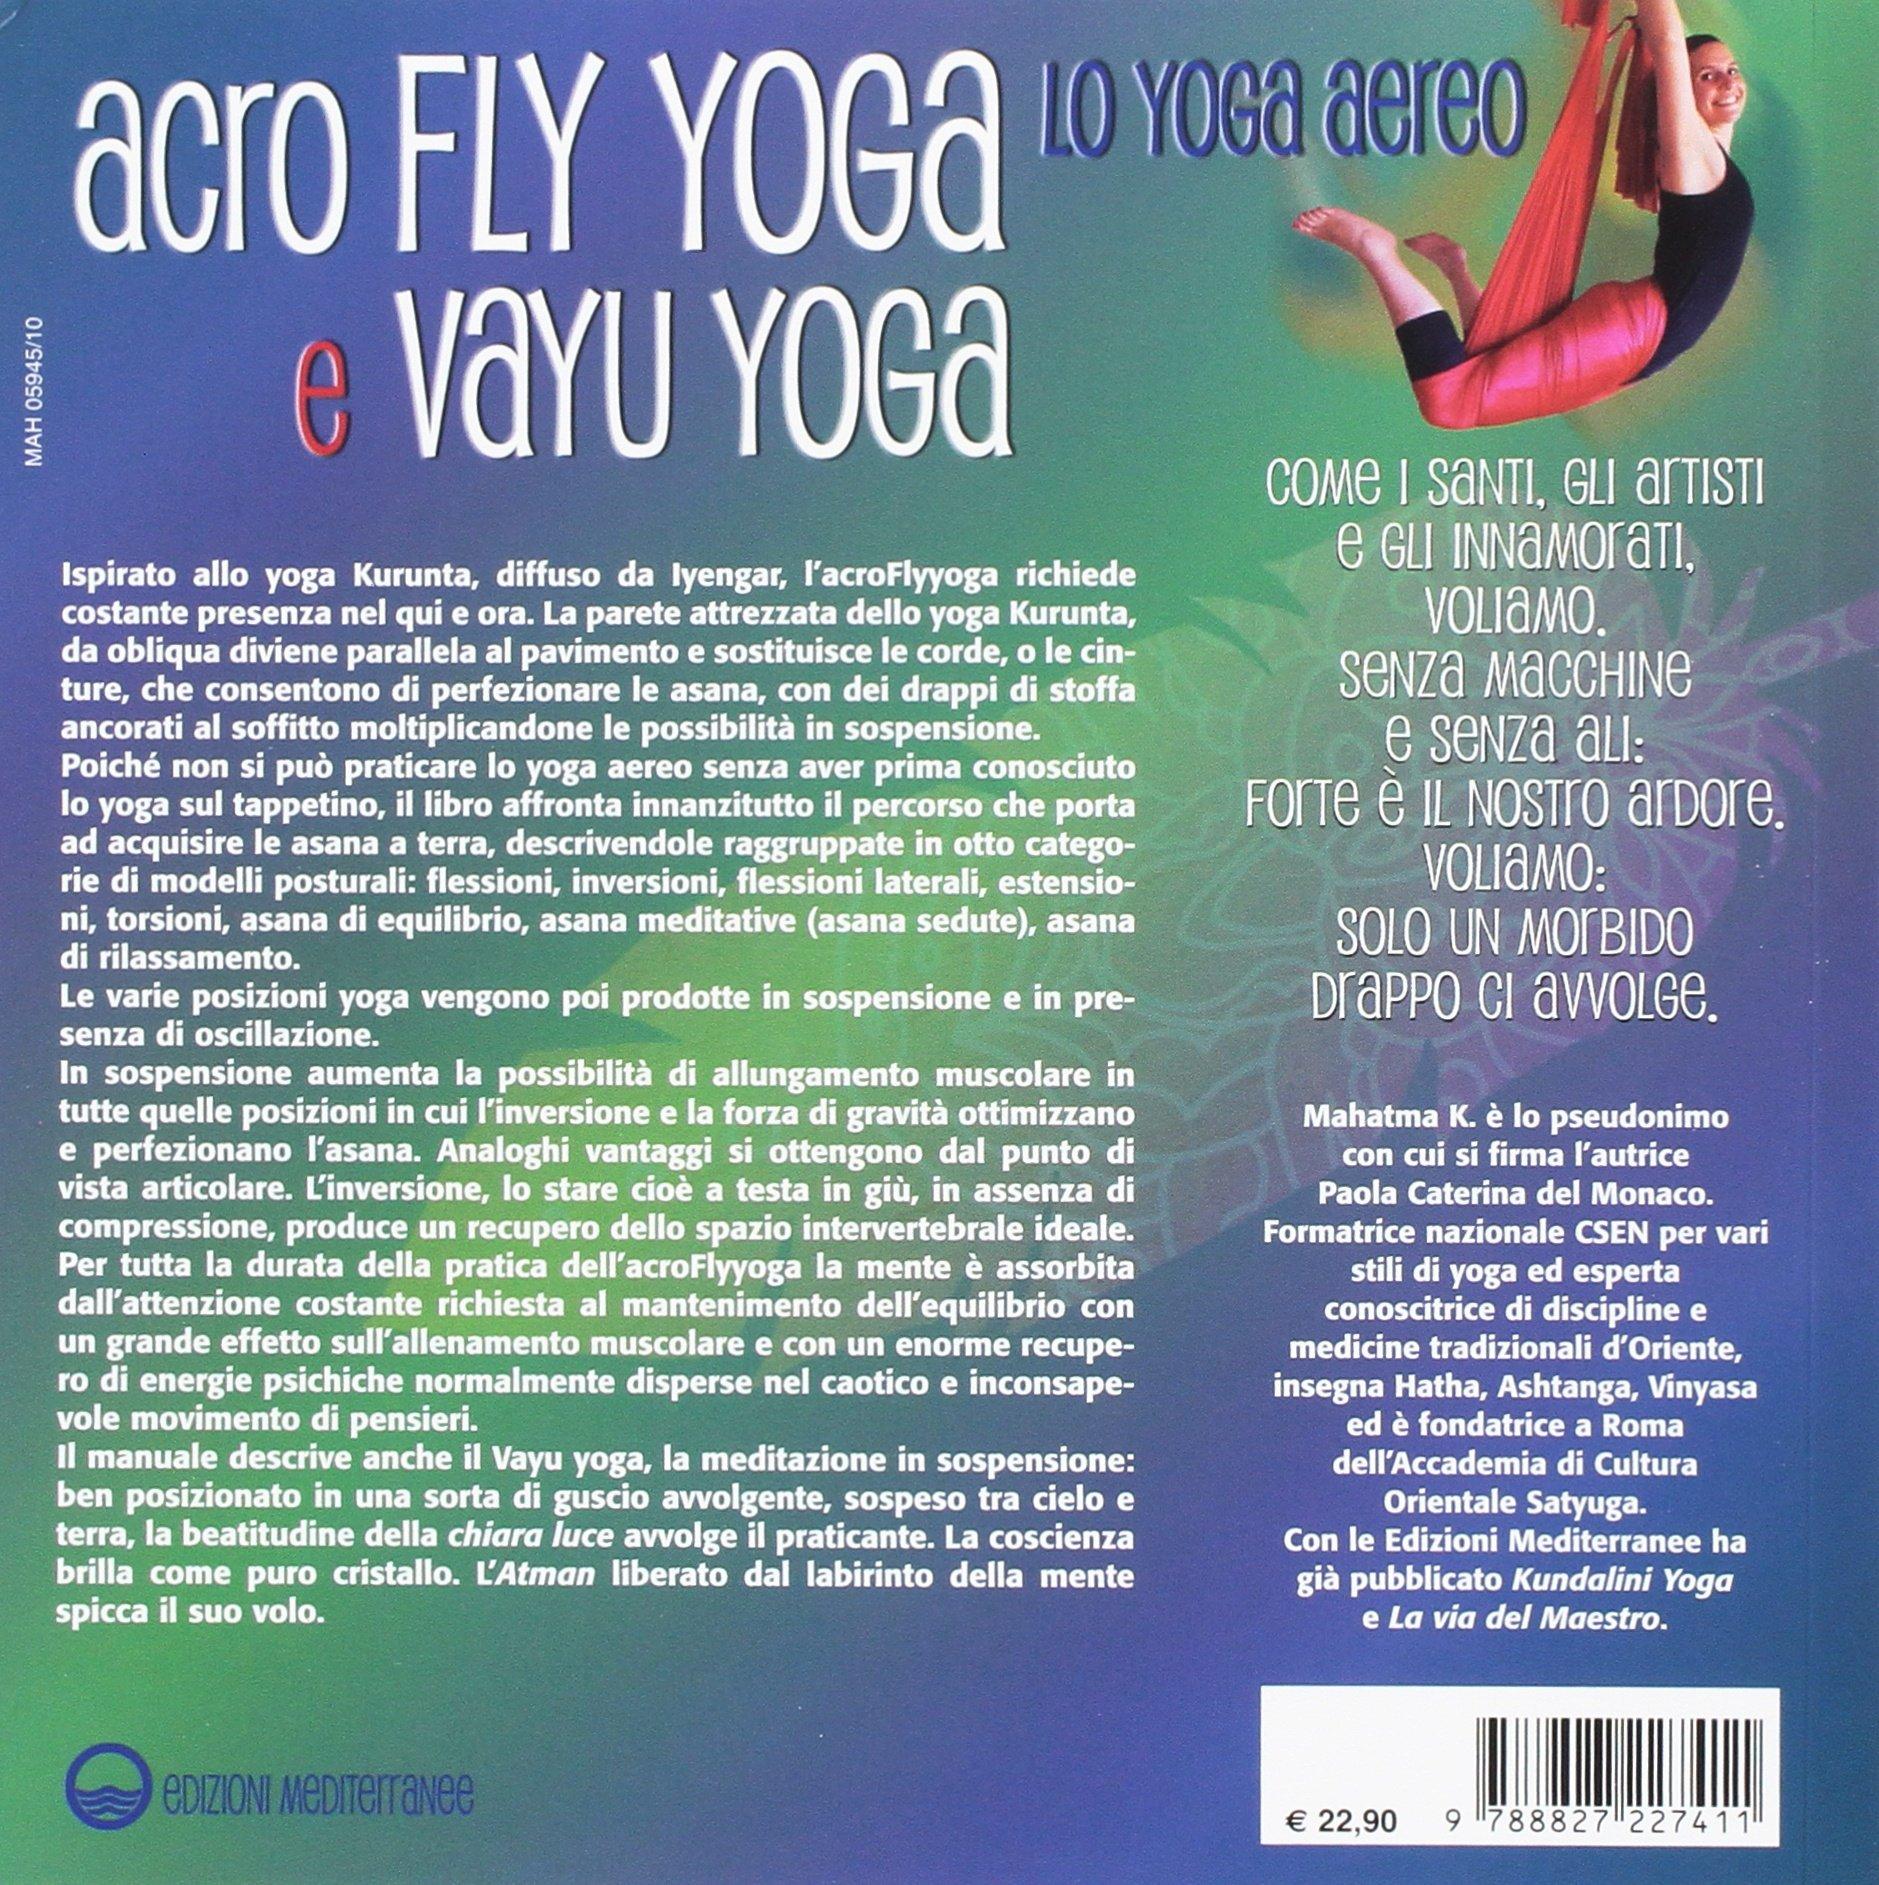 Acroflyyoga e vayu yoga. Lo yoga aereo. Con DVD video Yoga ...